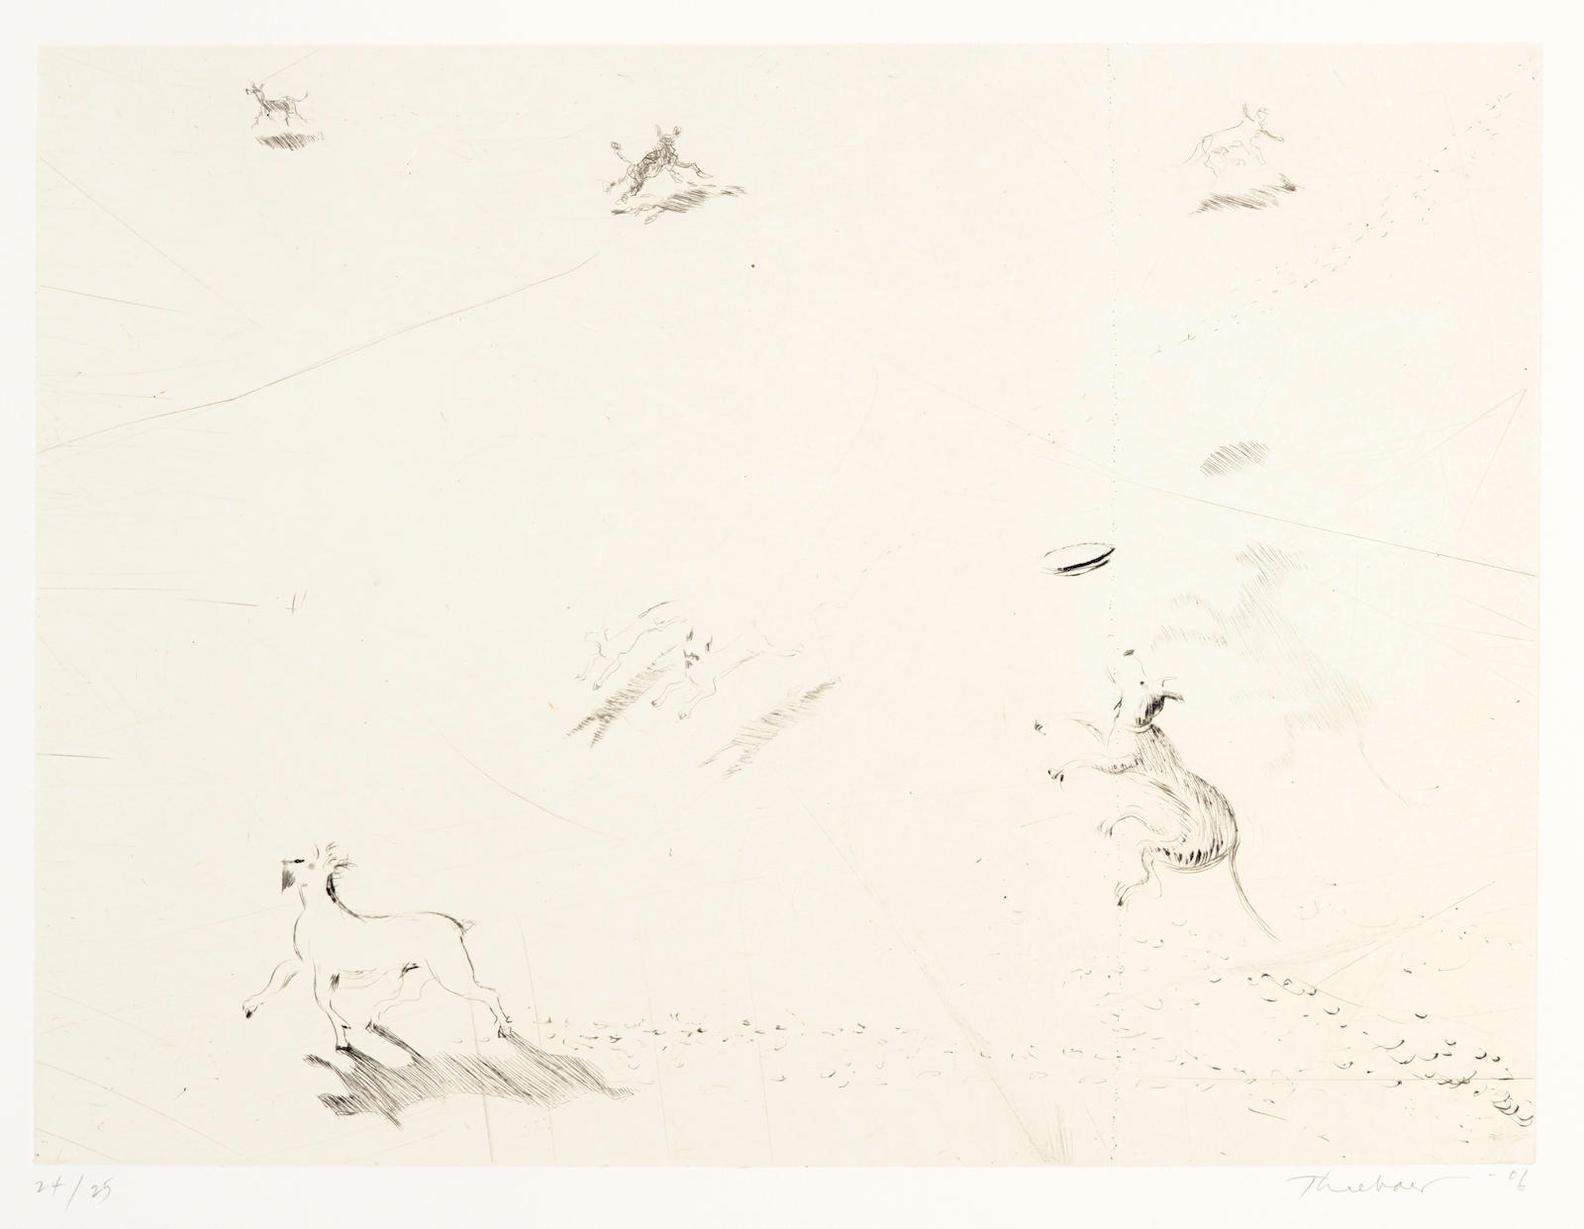 Wayne Thiebaud-Seven Dogs-2006